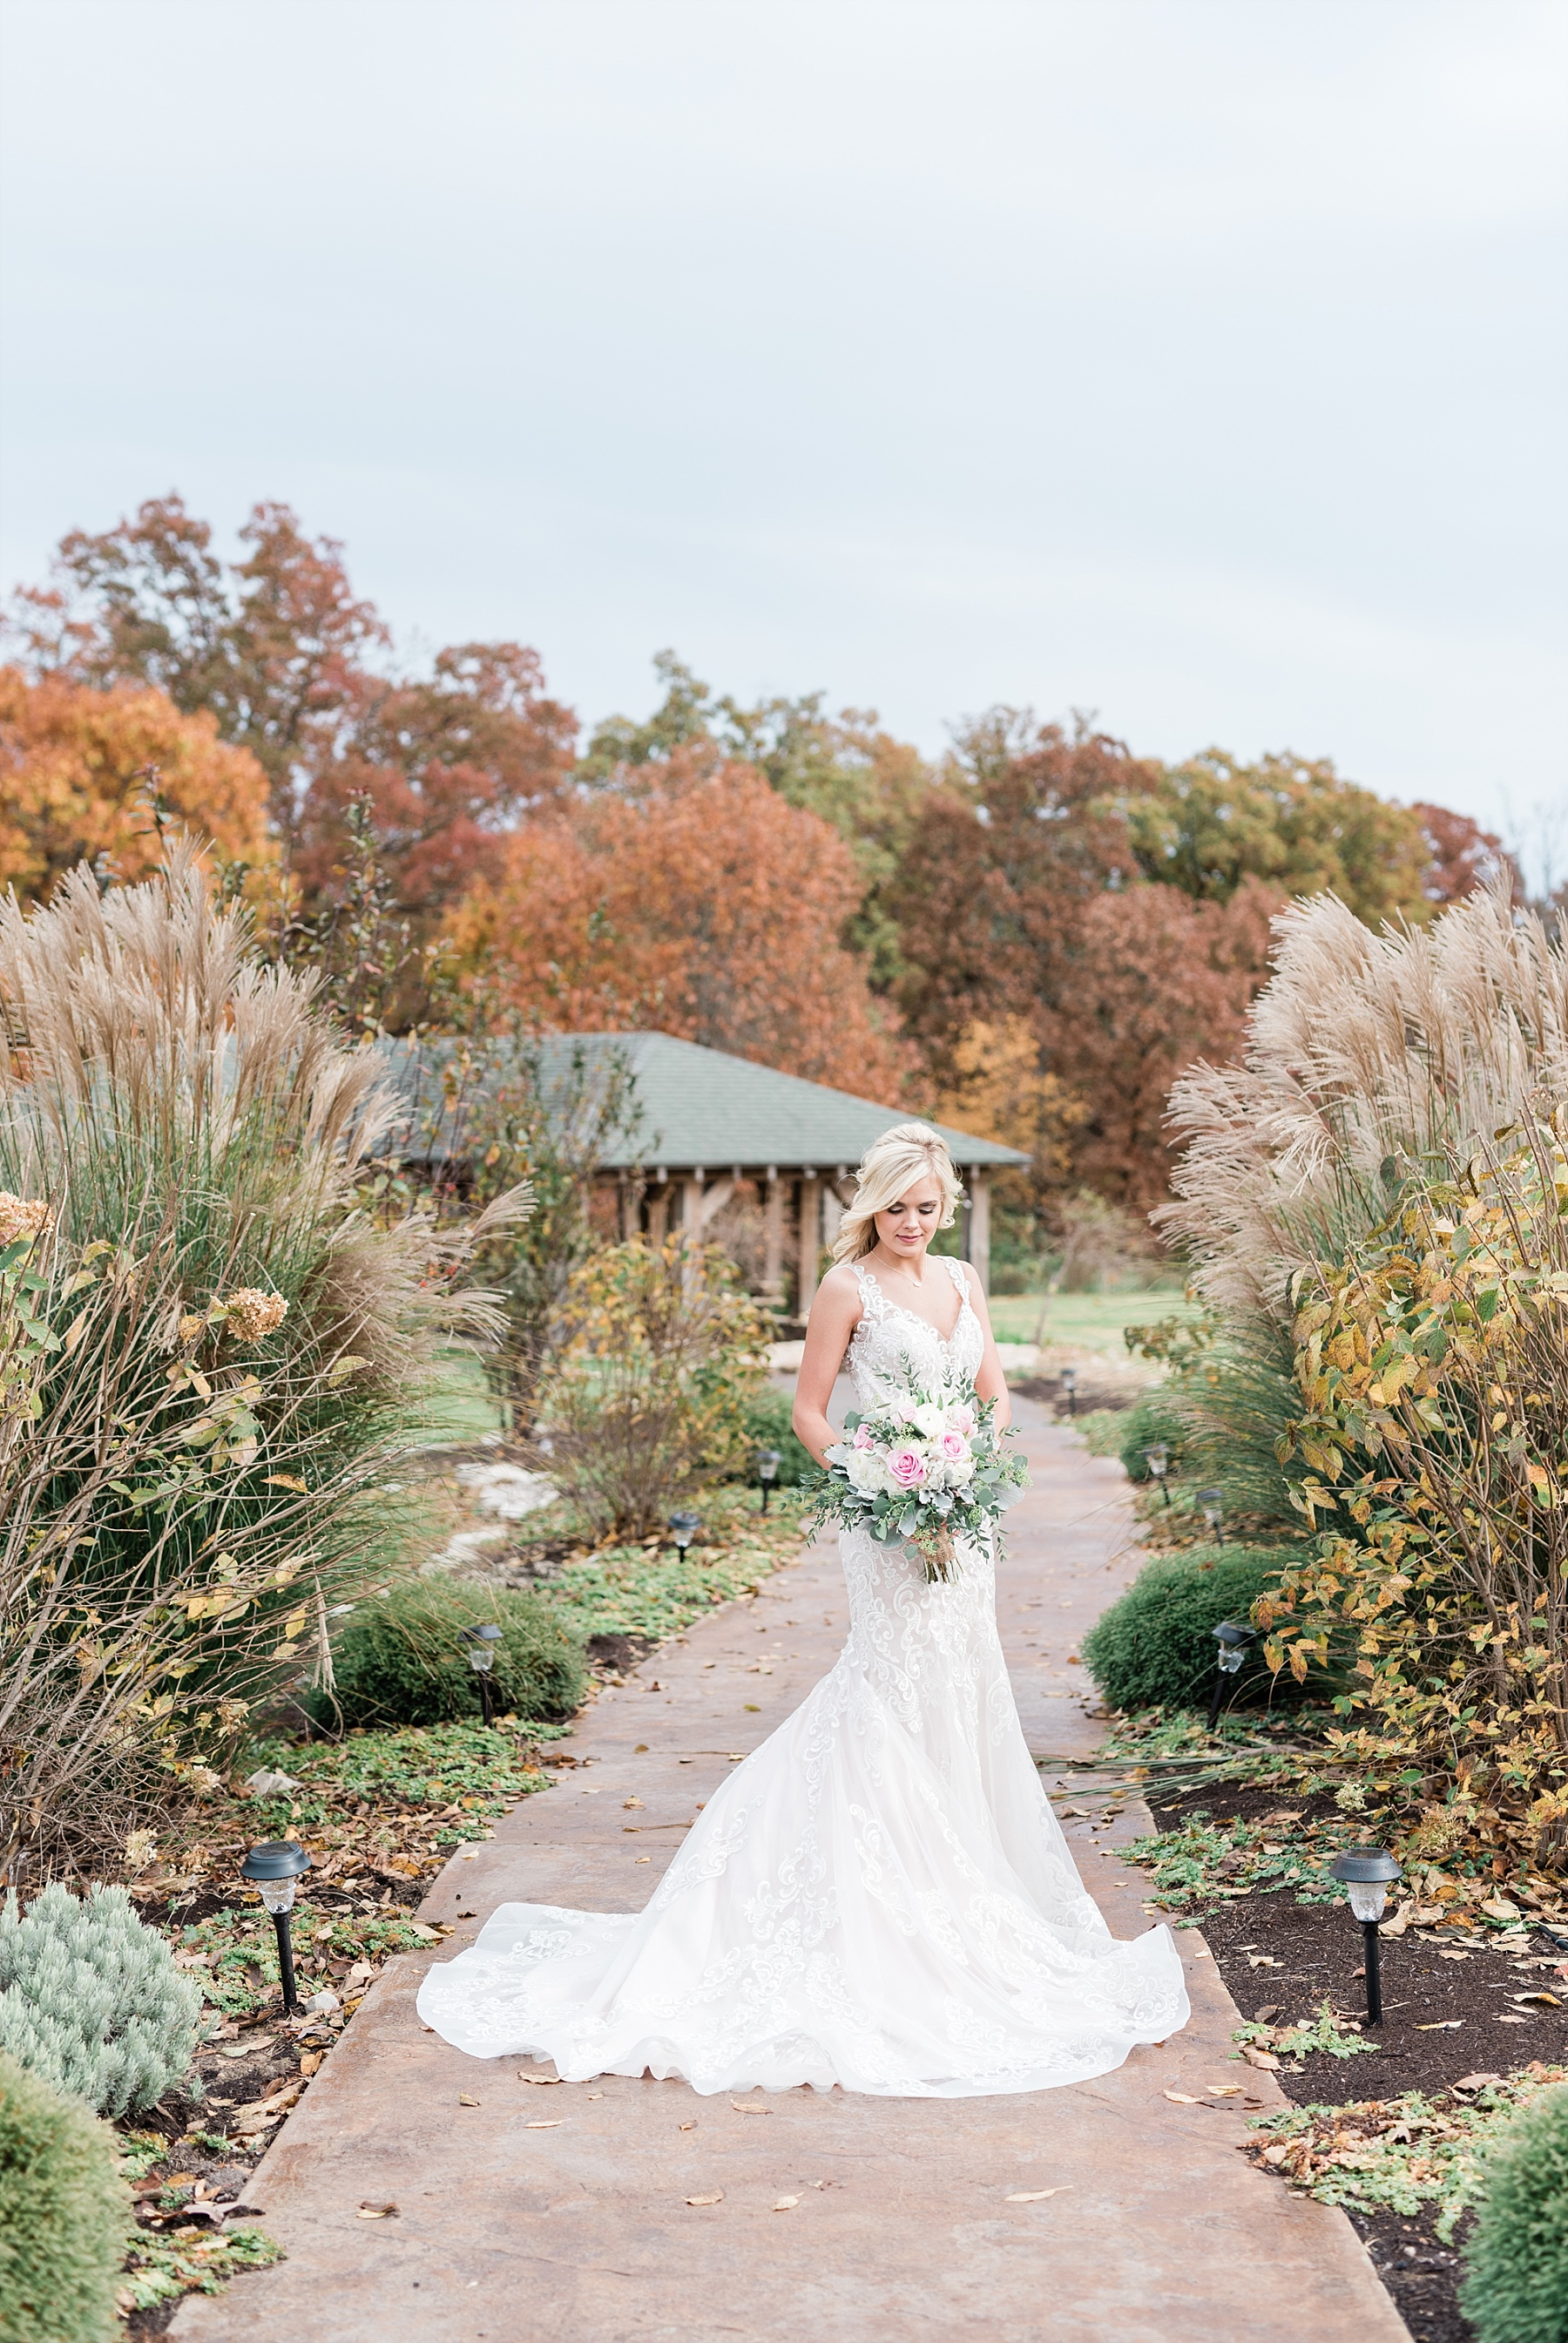 Lakeside Wedding in Fall at Mighty Oak Lodge by Misouri Wedding Photographer Kelsi Kliethermes Photography_0044.jpg